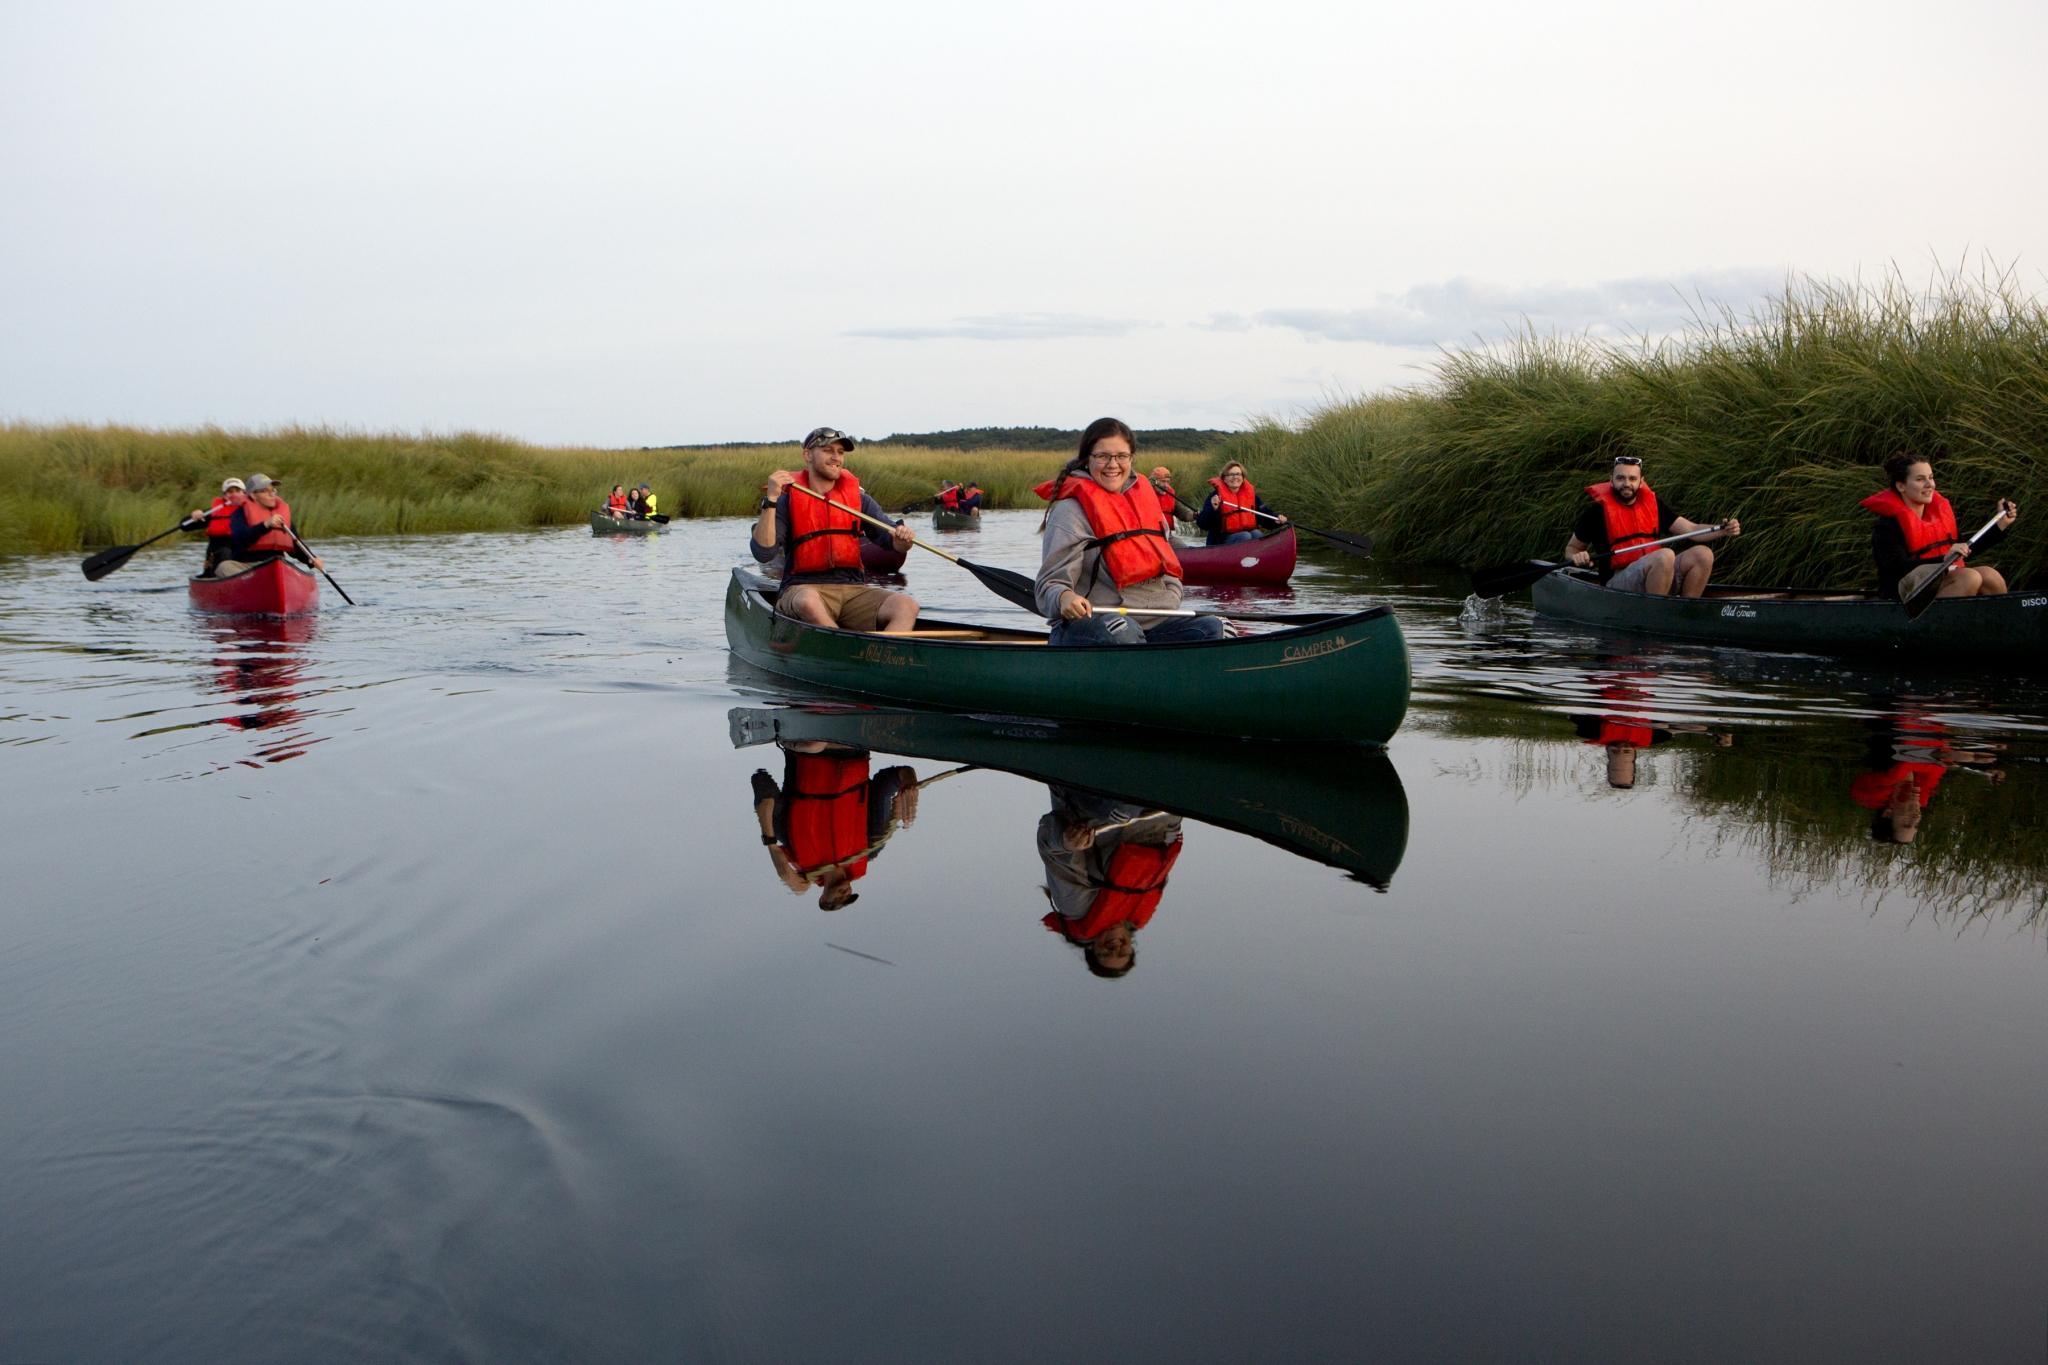 Canoe Tour with LEA